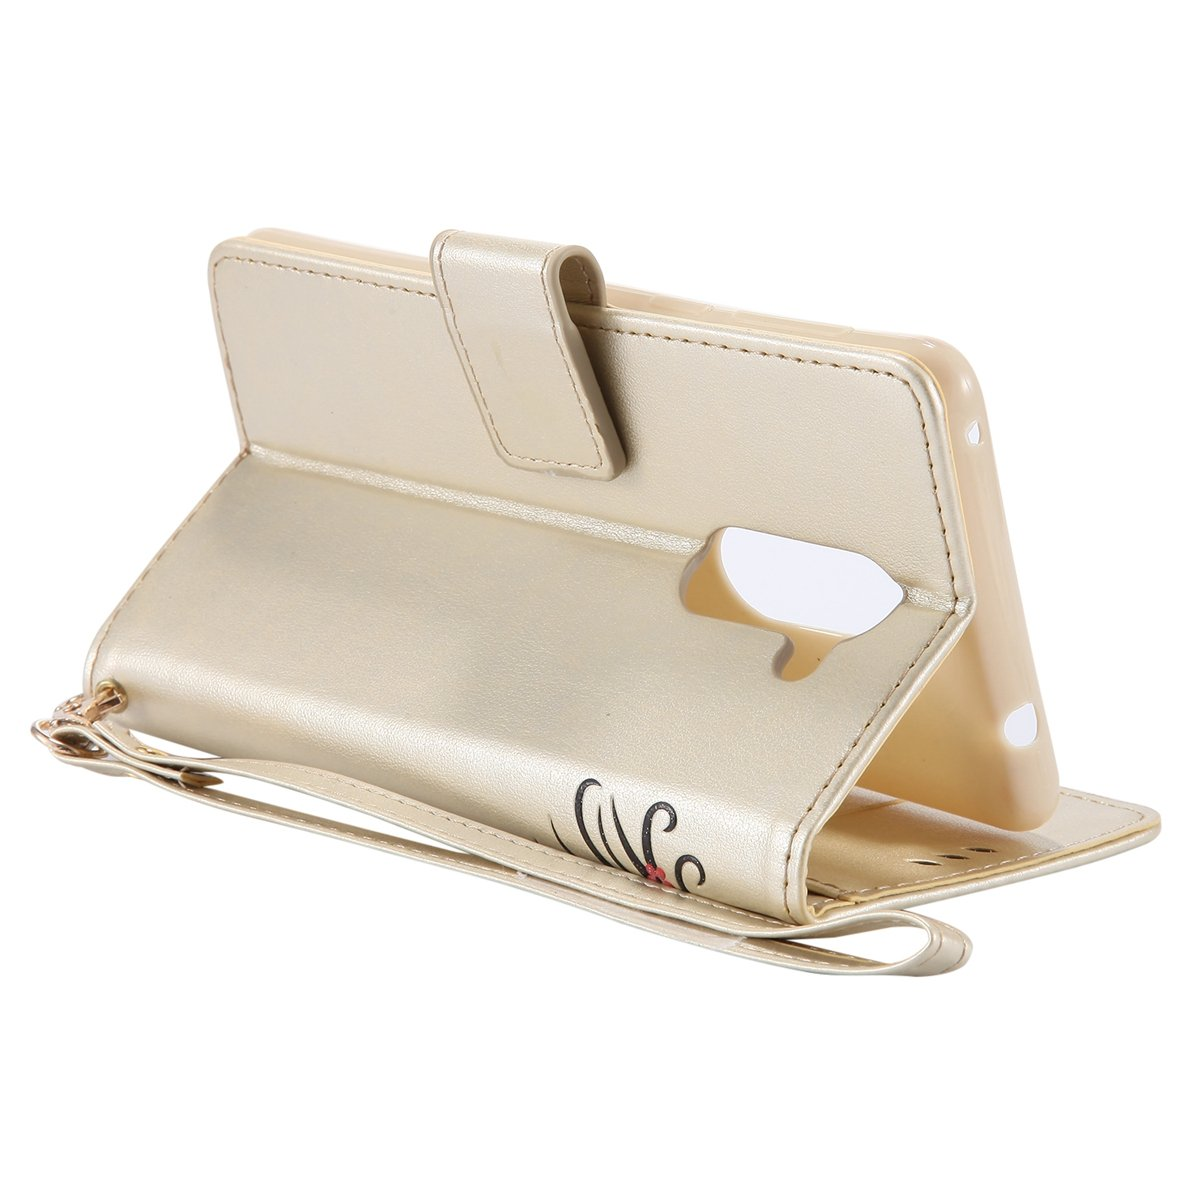 Felfy Elegant Huawei Honor 6X H/ülle Leder,Huawei Honor 6X Case Leder D/ünn,Huawei Honor 6X Tasche Leder Golden Flip Wallet Bookstyle Handyh/ülle M/ädchen und Katze 3D Pr/ägung Muster Nacht Leuchtende Luminous Lederh/ülle Magnetvers